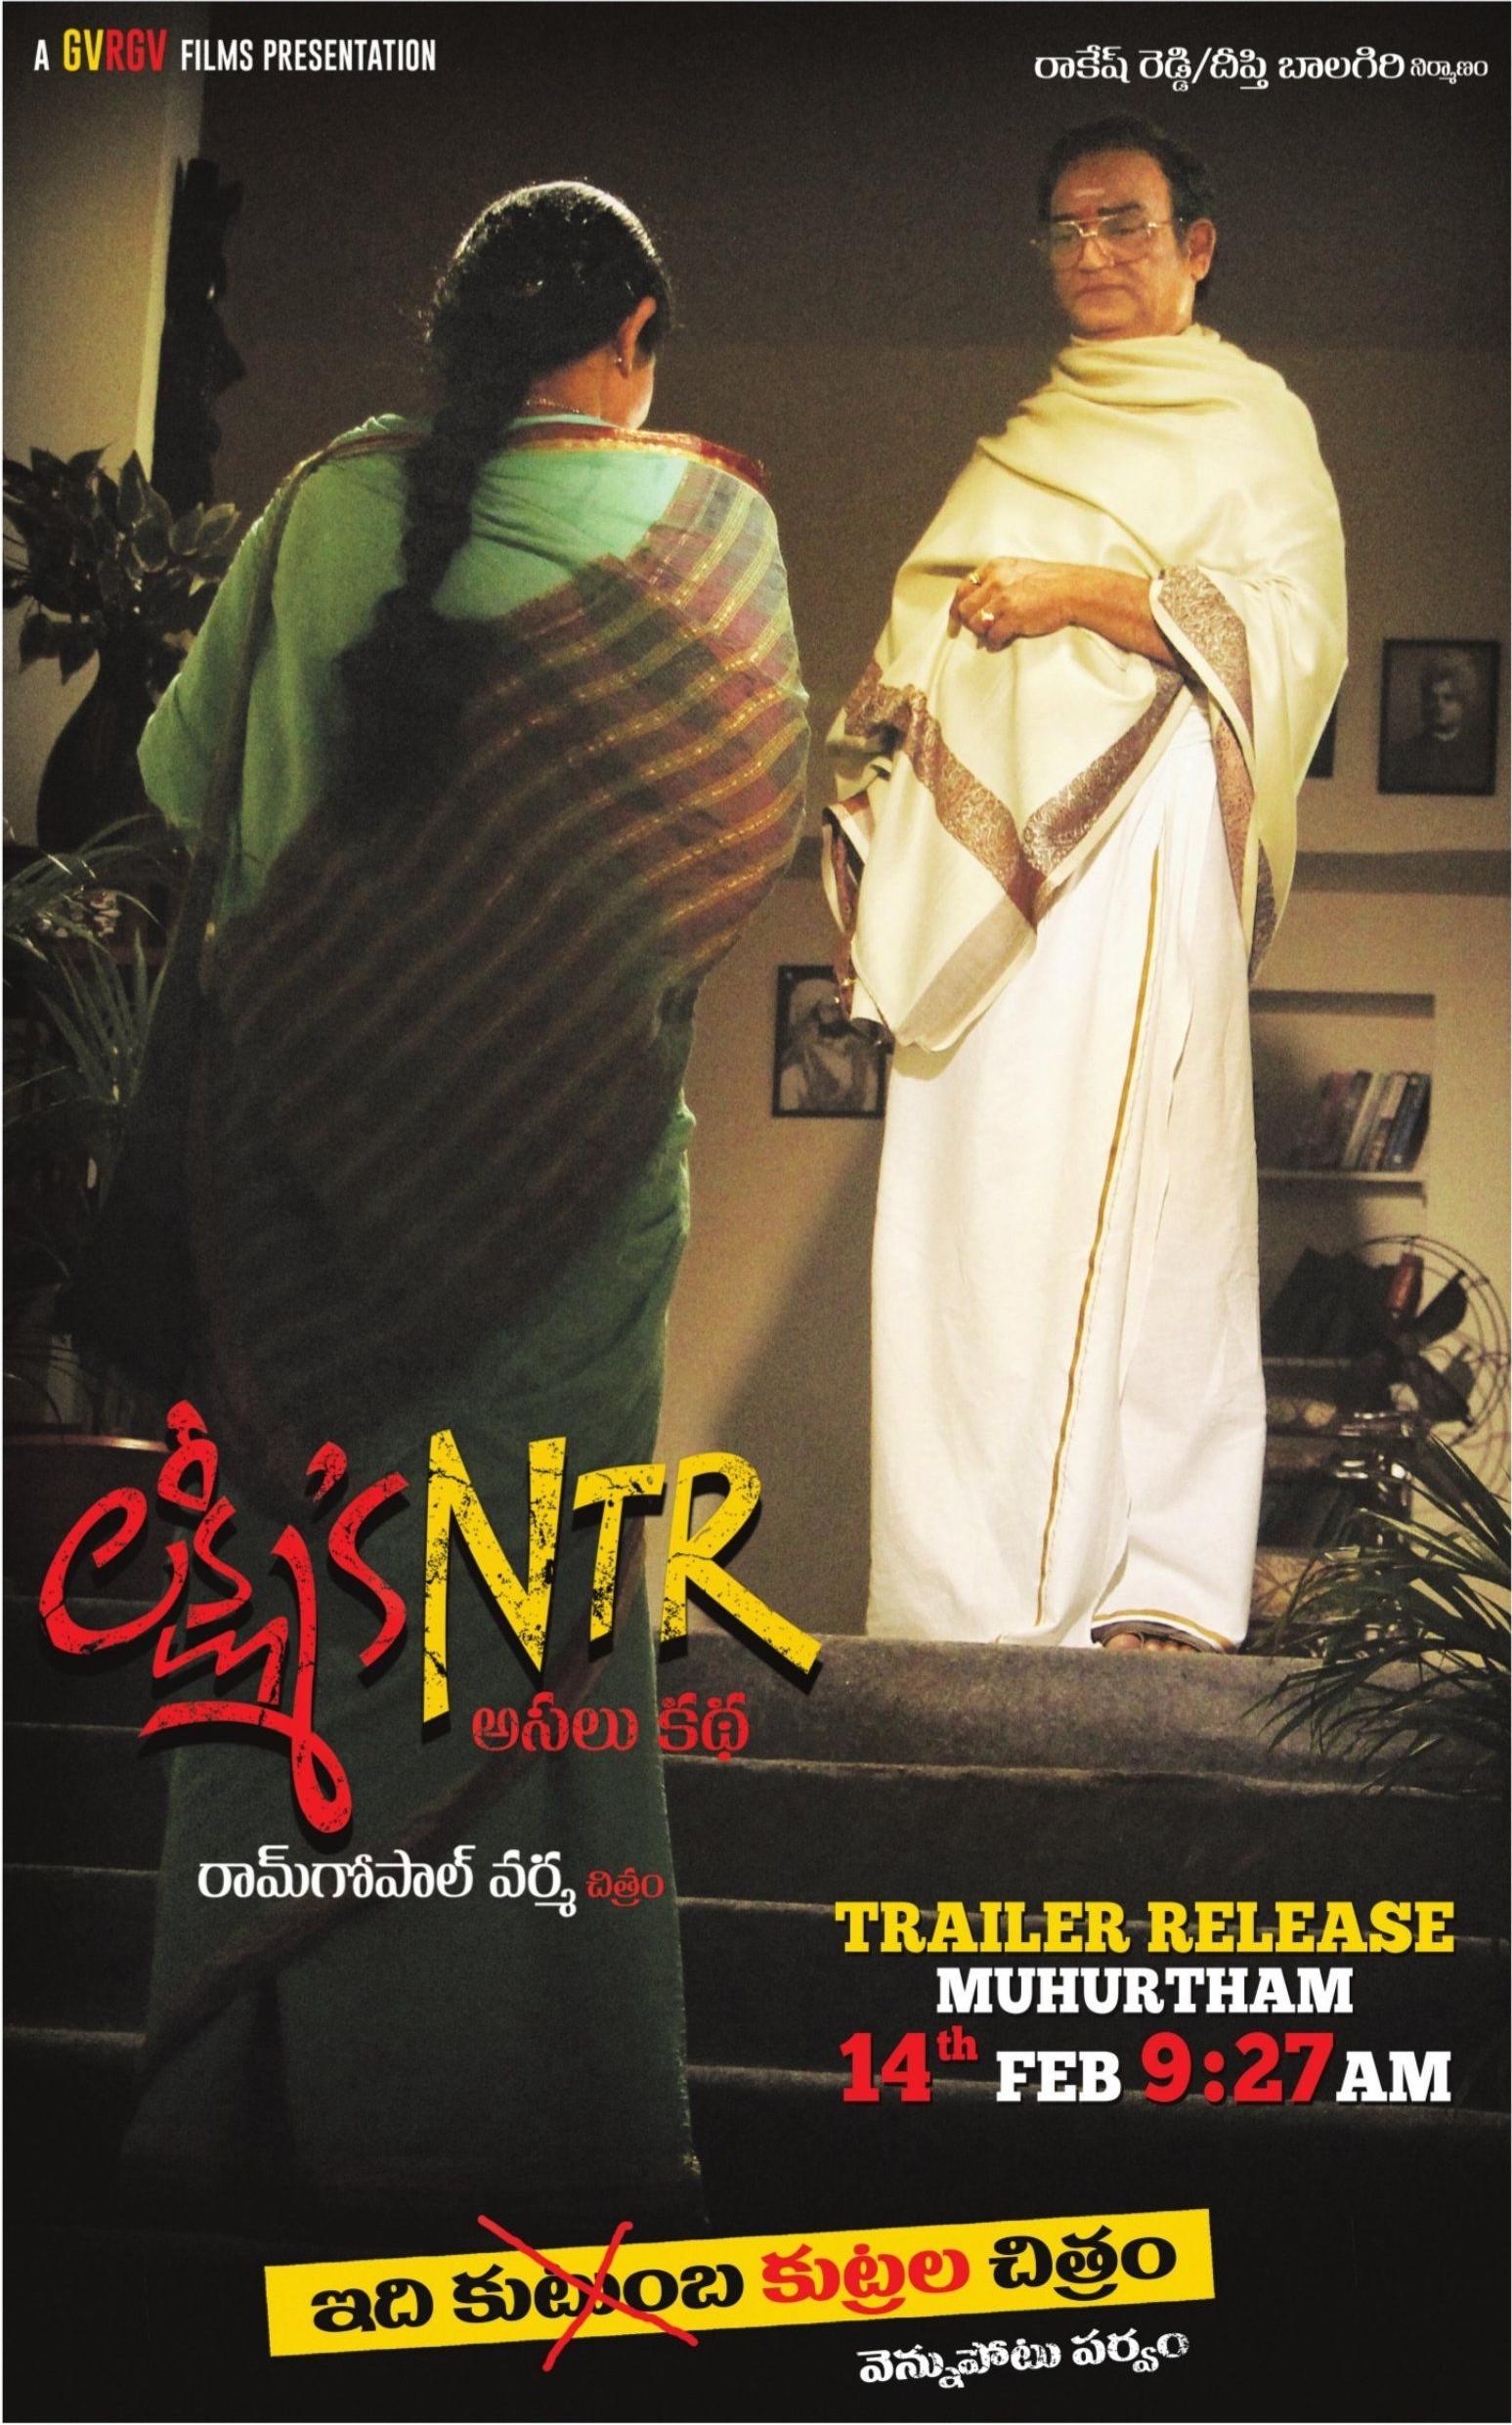 Rajsekhar Aningi in Lakshmi's NTR Trailer Release Today Posters